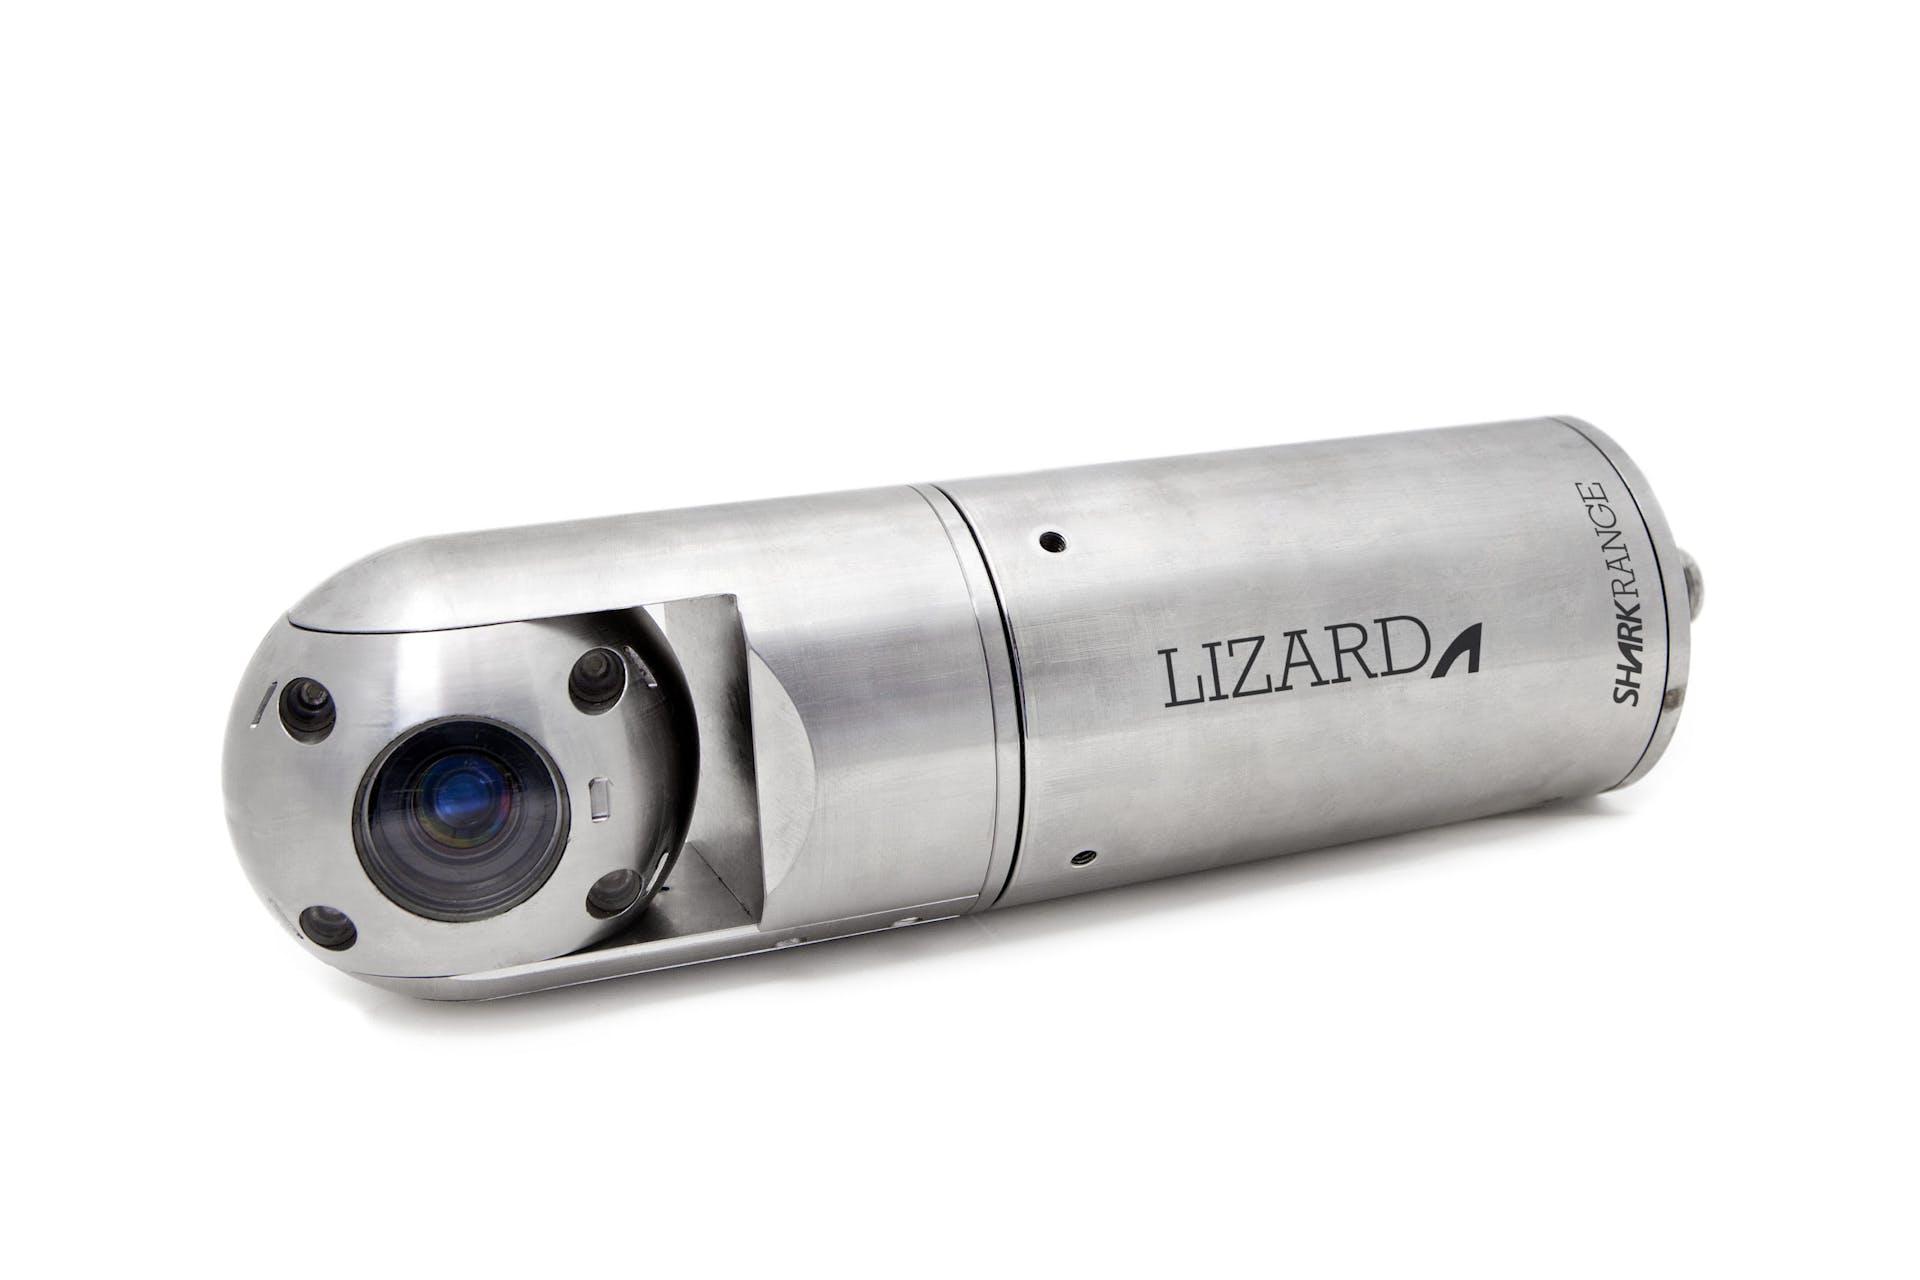 Lizard Shark Subsea underwater pan tilt inspection camera